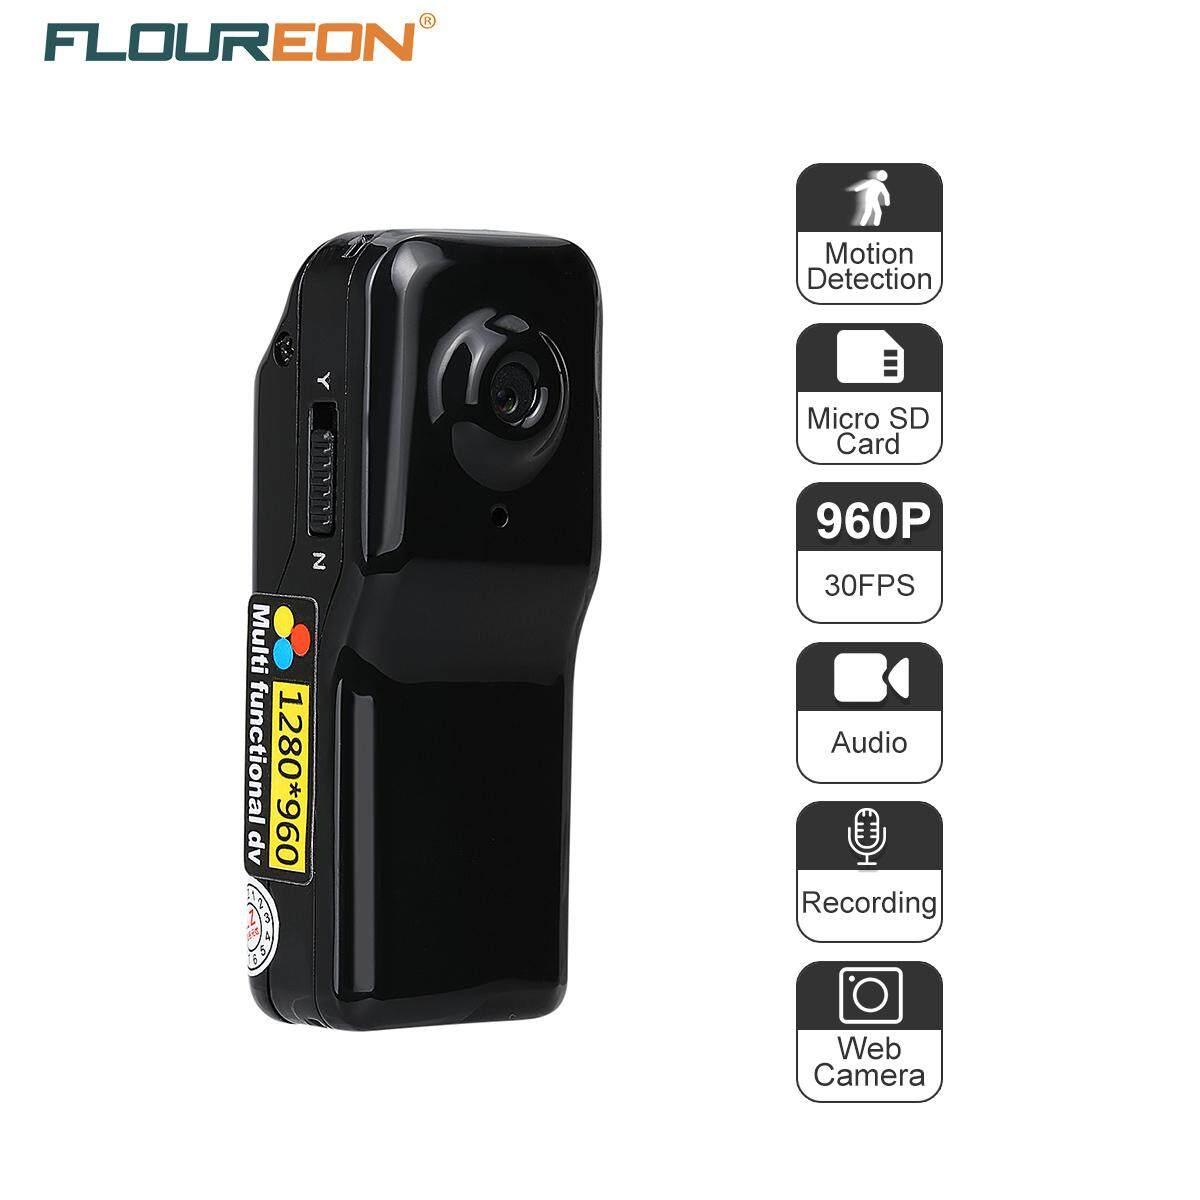 Mini DV FLOUREON 1.3 Mega Pixels HD DVR Sports Camcorder Video/Audio/Capture Motion Detection Recorder PC Web Camera Black